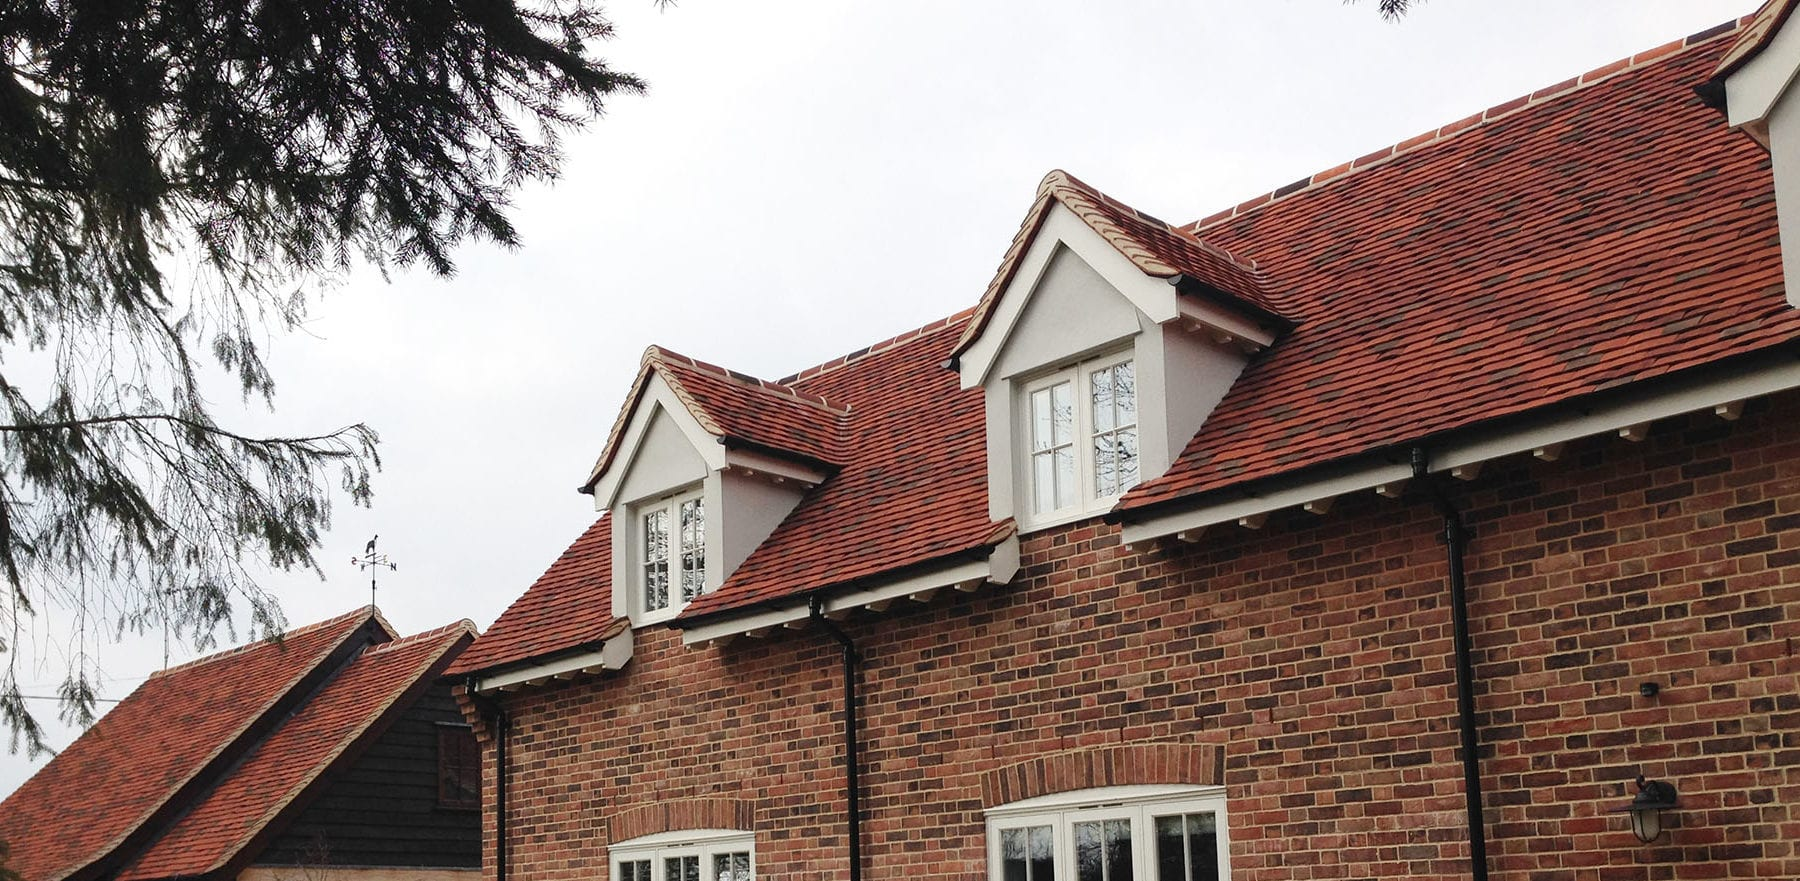 Lifestiles - Handmade Multi Clay Roof Tiles - Takeley, England 5